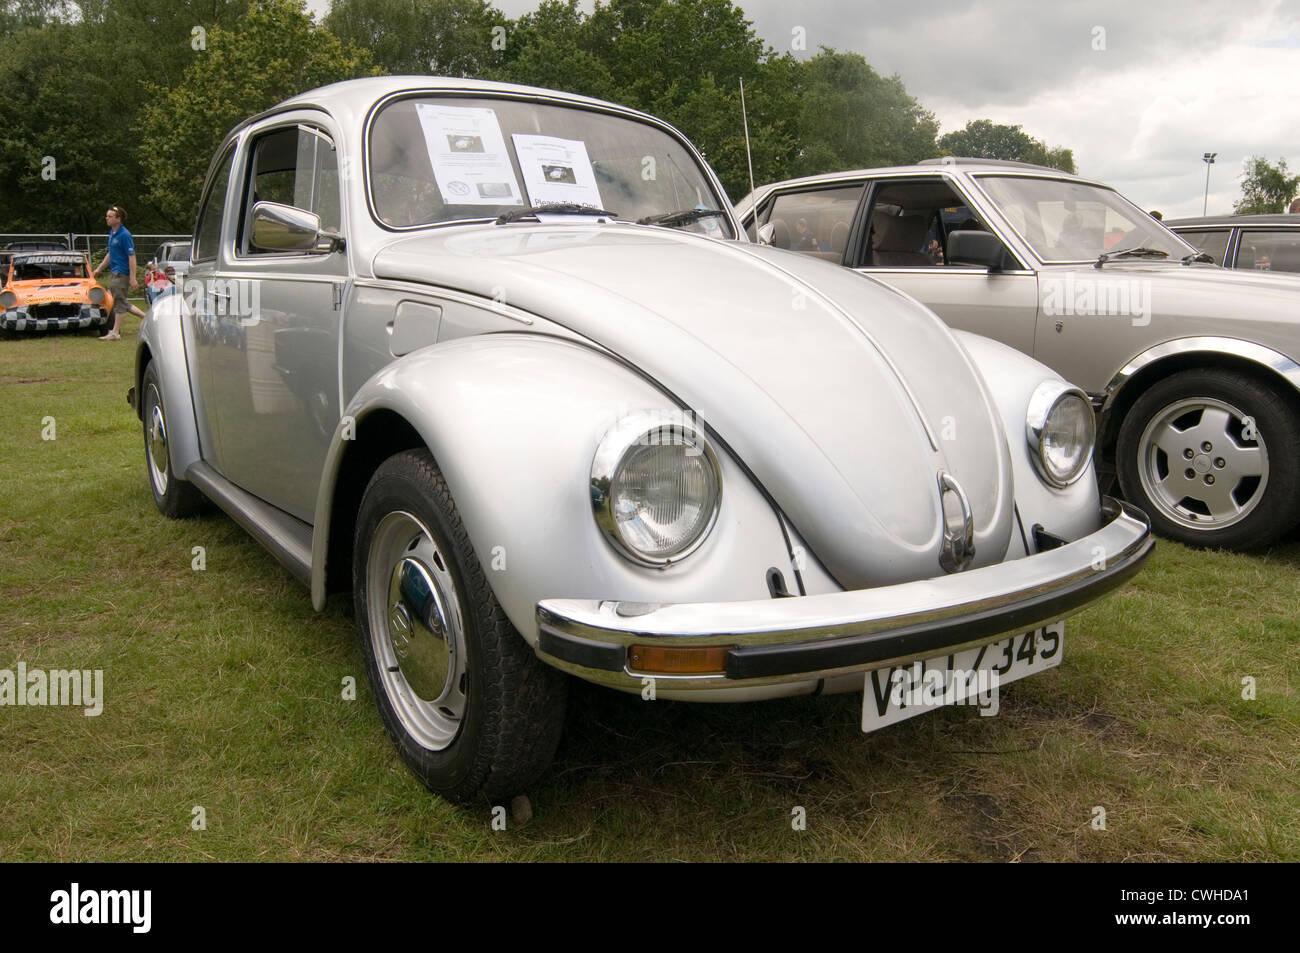 vw beetle 1970's super german car cars late classic cars 1302 1300 volkswagen - Stock Image